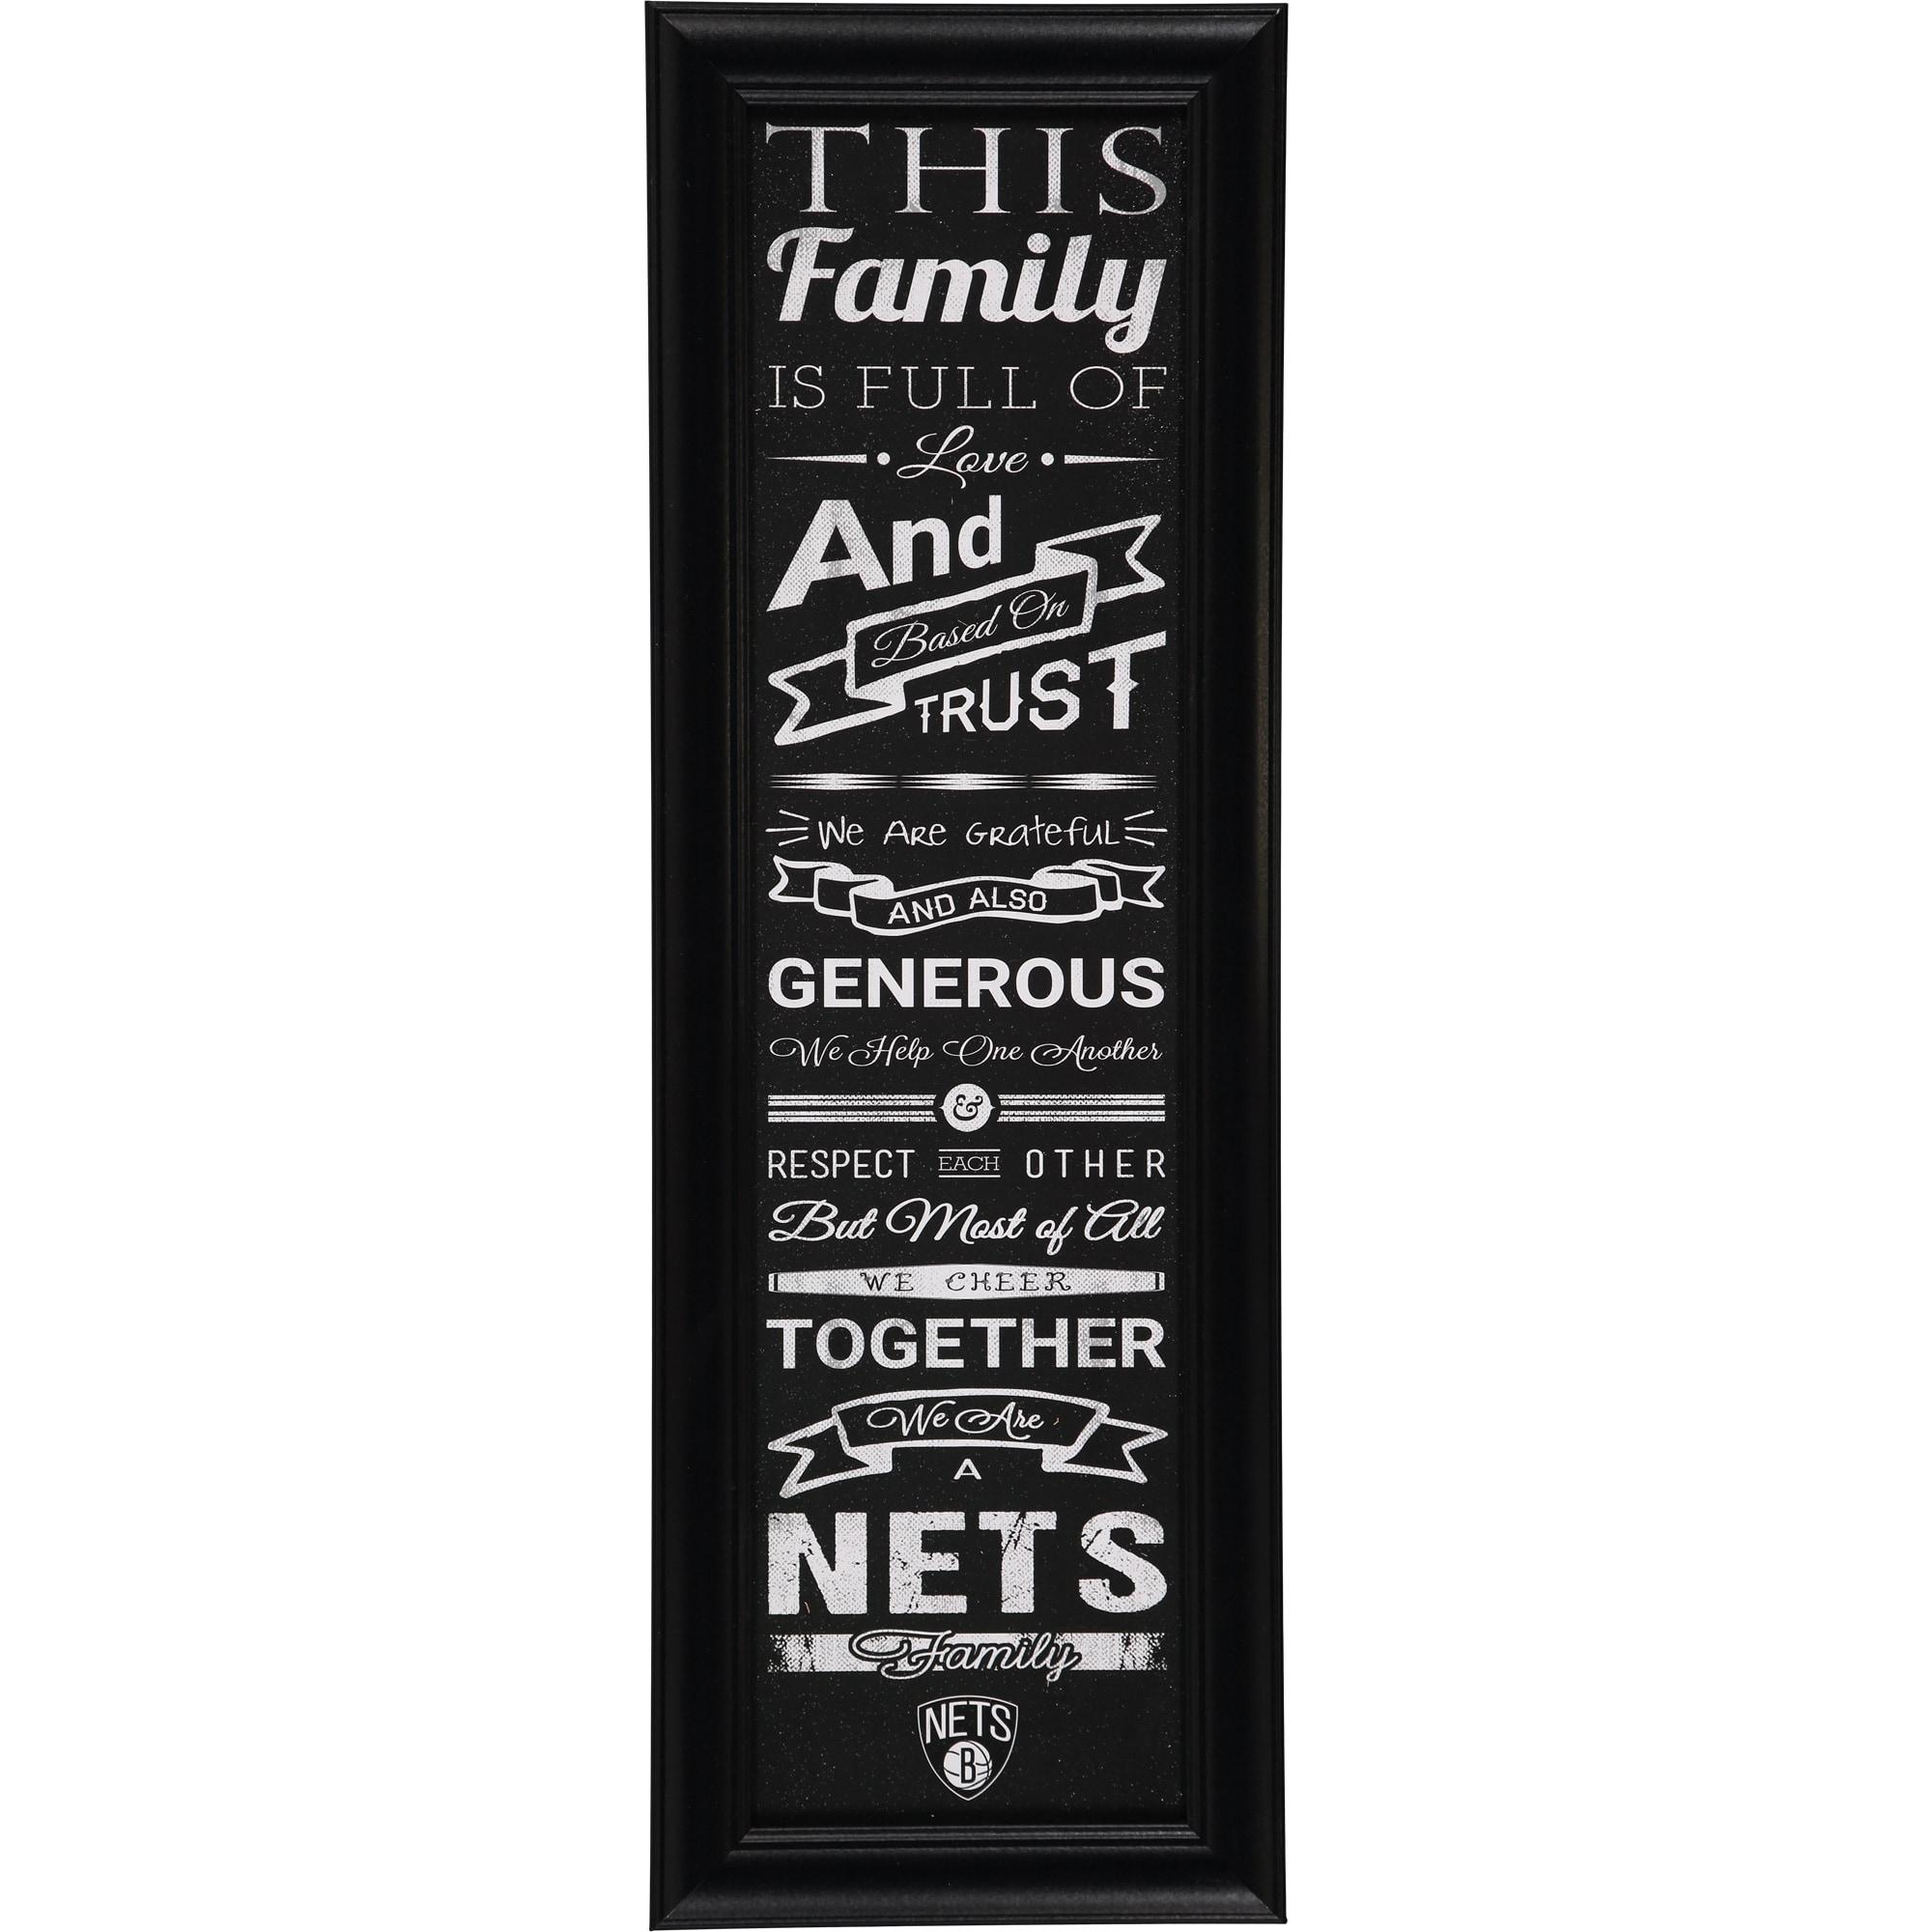 Brooklyn Nets Crackle Family Cheer Framed Art